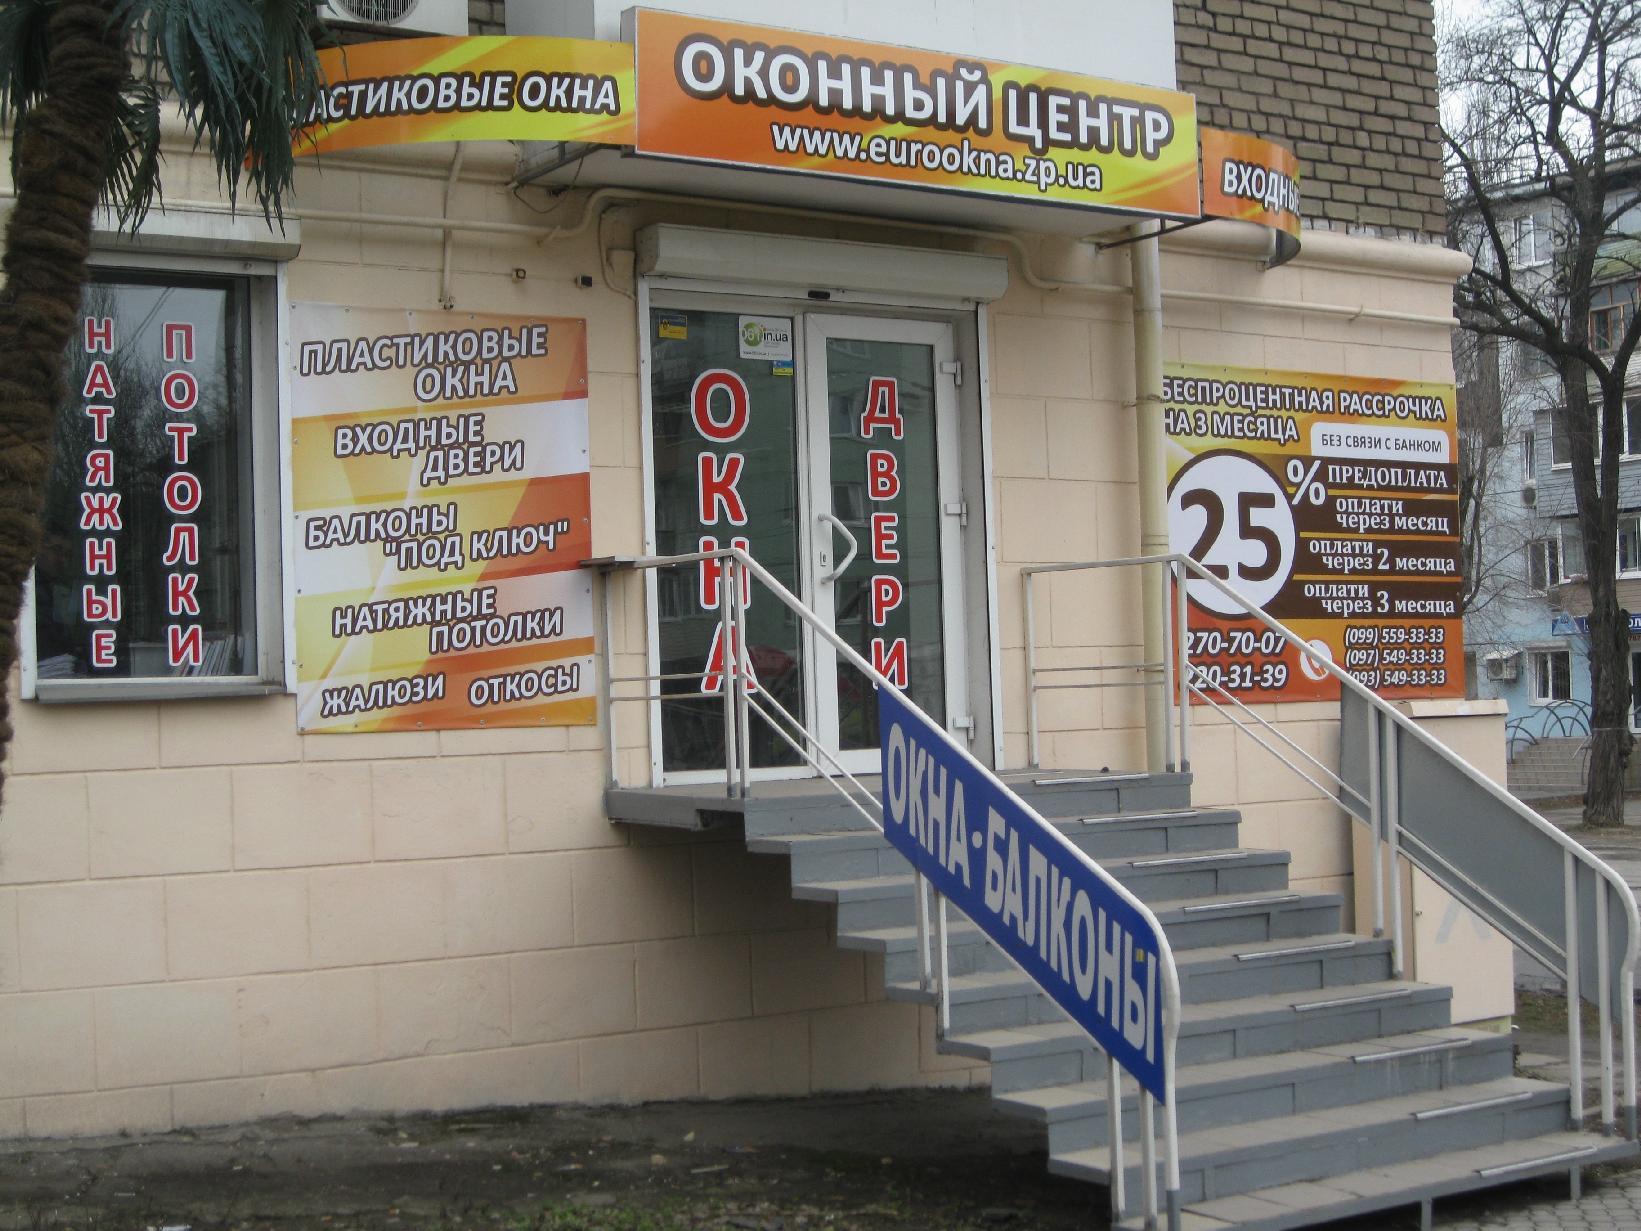 Фото центрального входа пр.Ленина 99